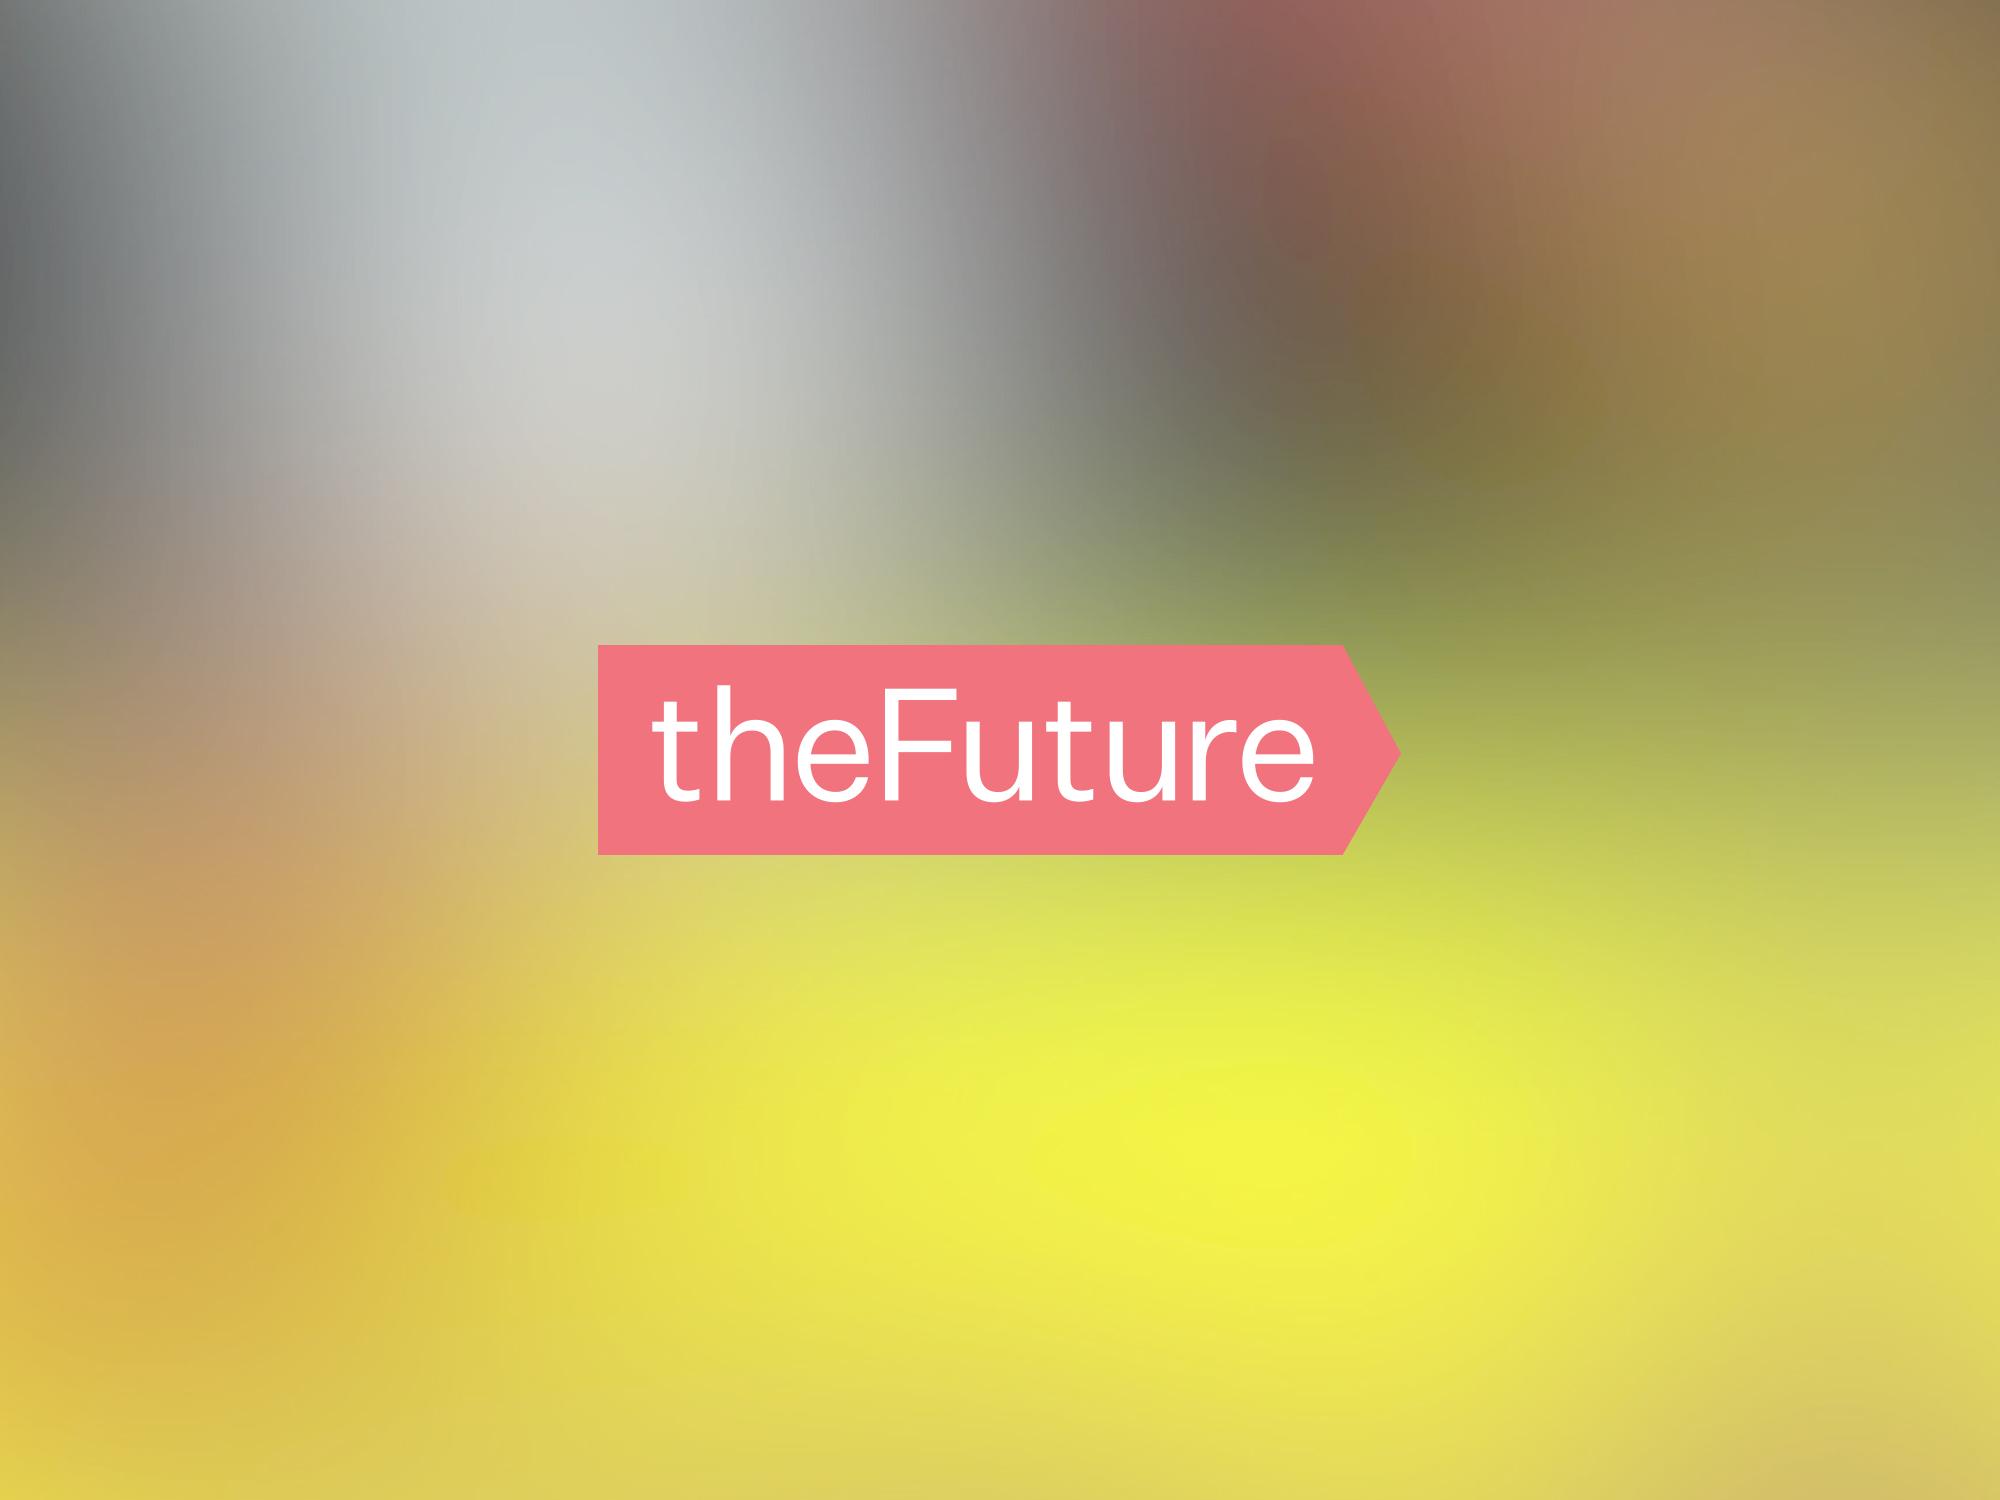 Cover image: The Future